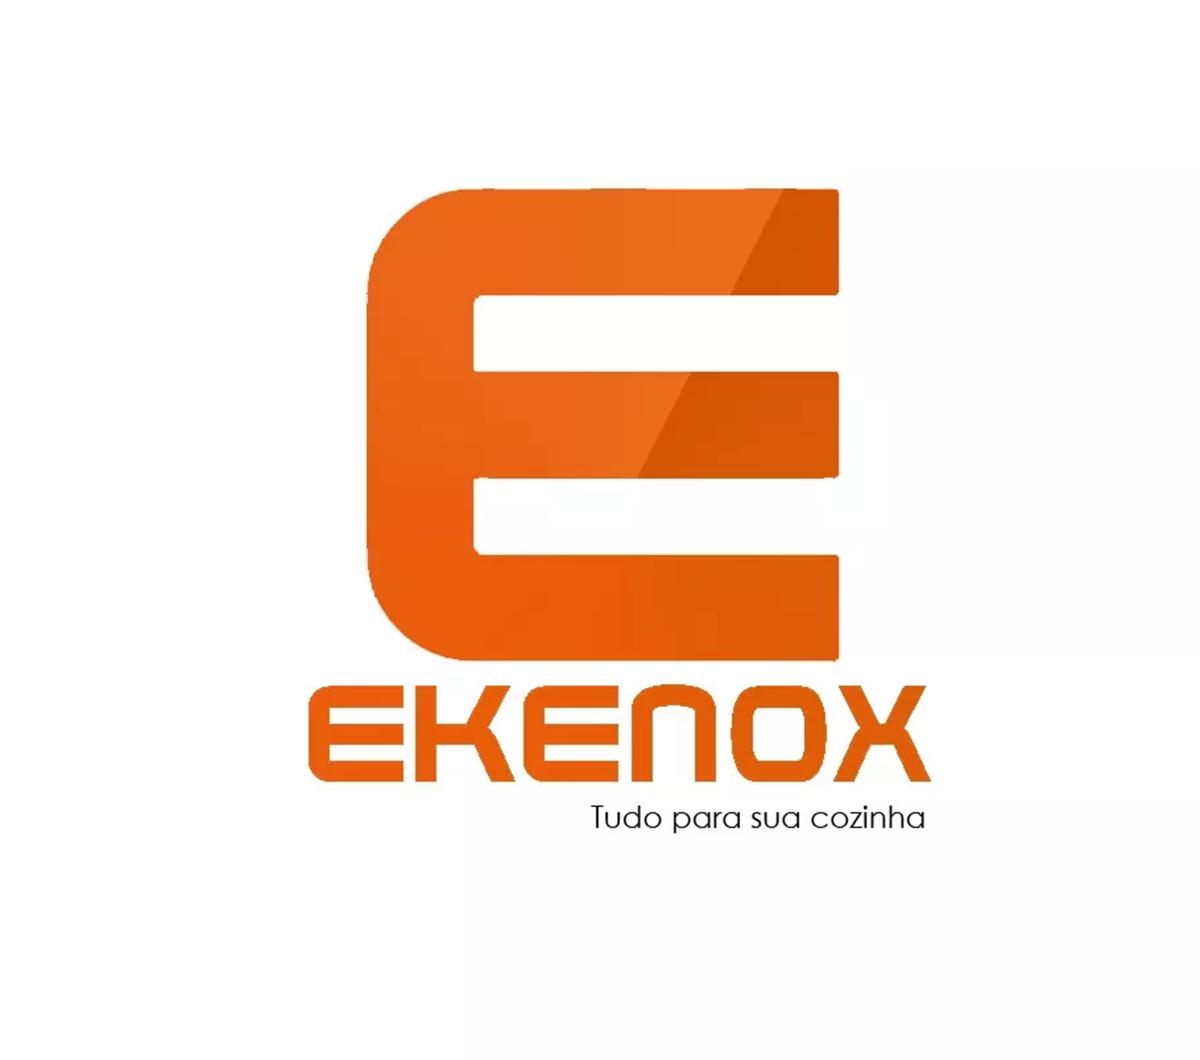 Mesa Inox 1,45 x 0,55 PG EKENOX K  - EKENOX- Equipamentos Industriais